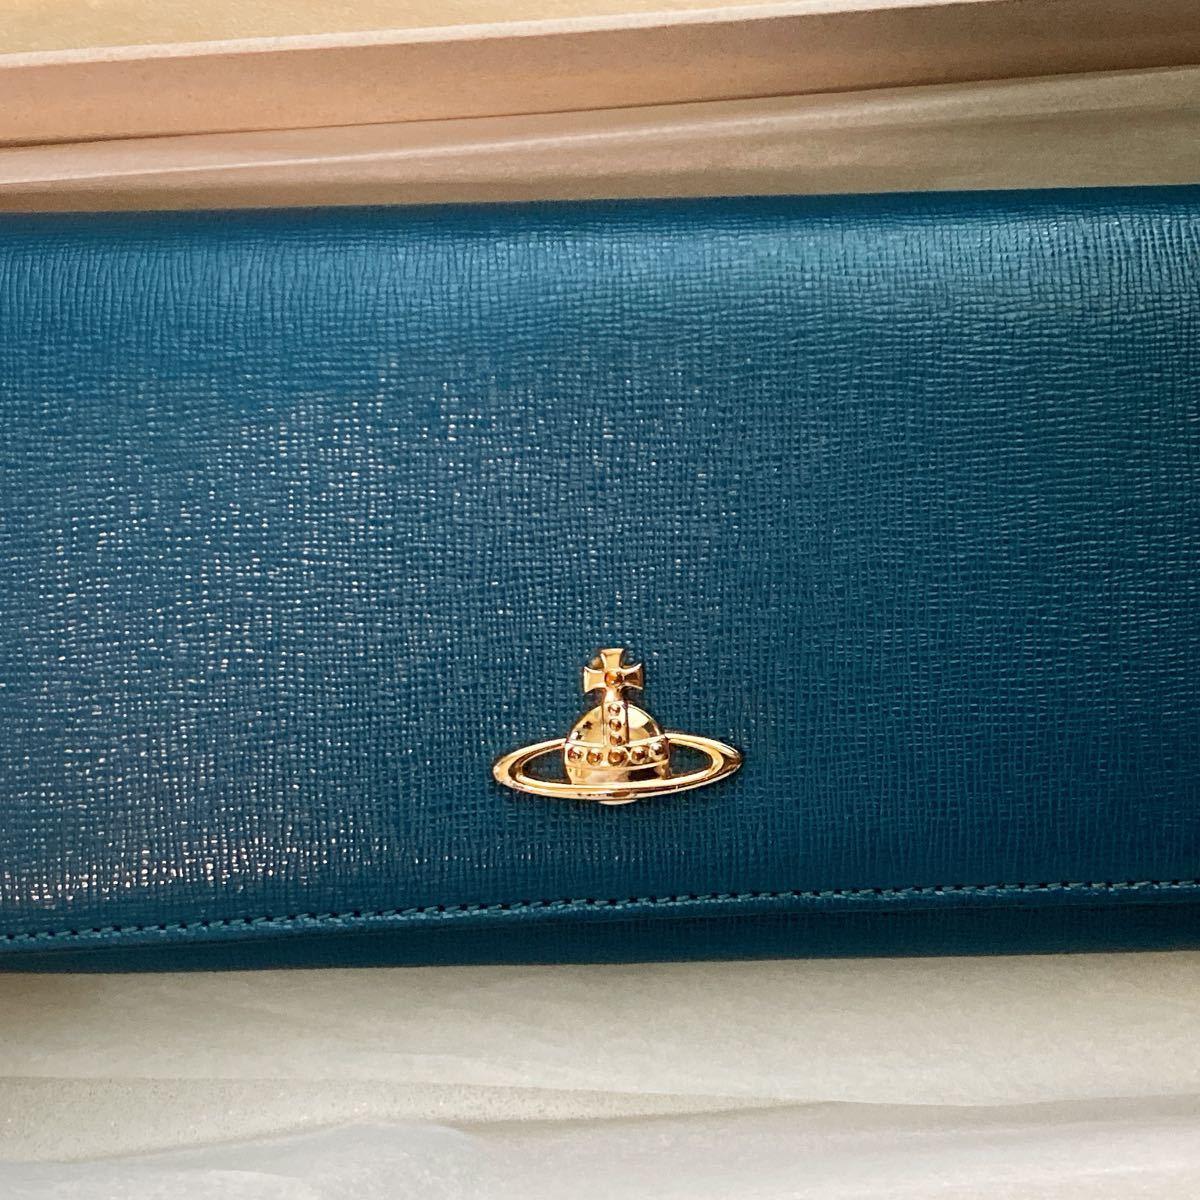 Vivienne Westwood 長財布 ヴィヴィアンウエストウッド レディース長財布 ネイビー ブルー 青